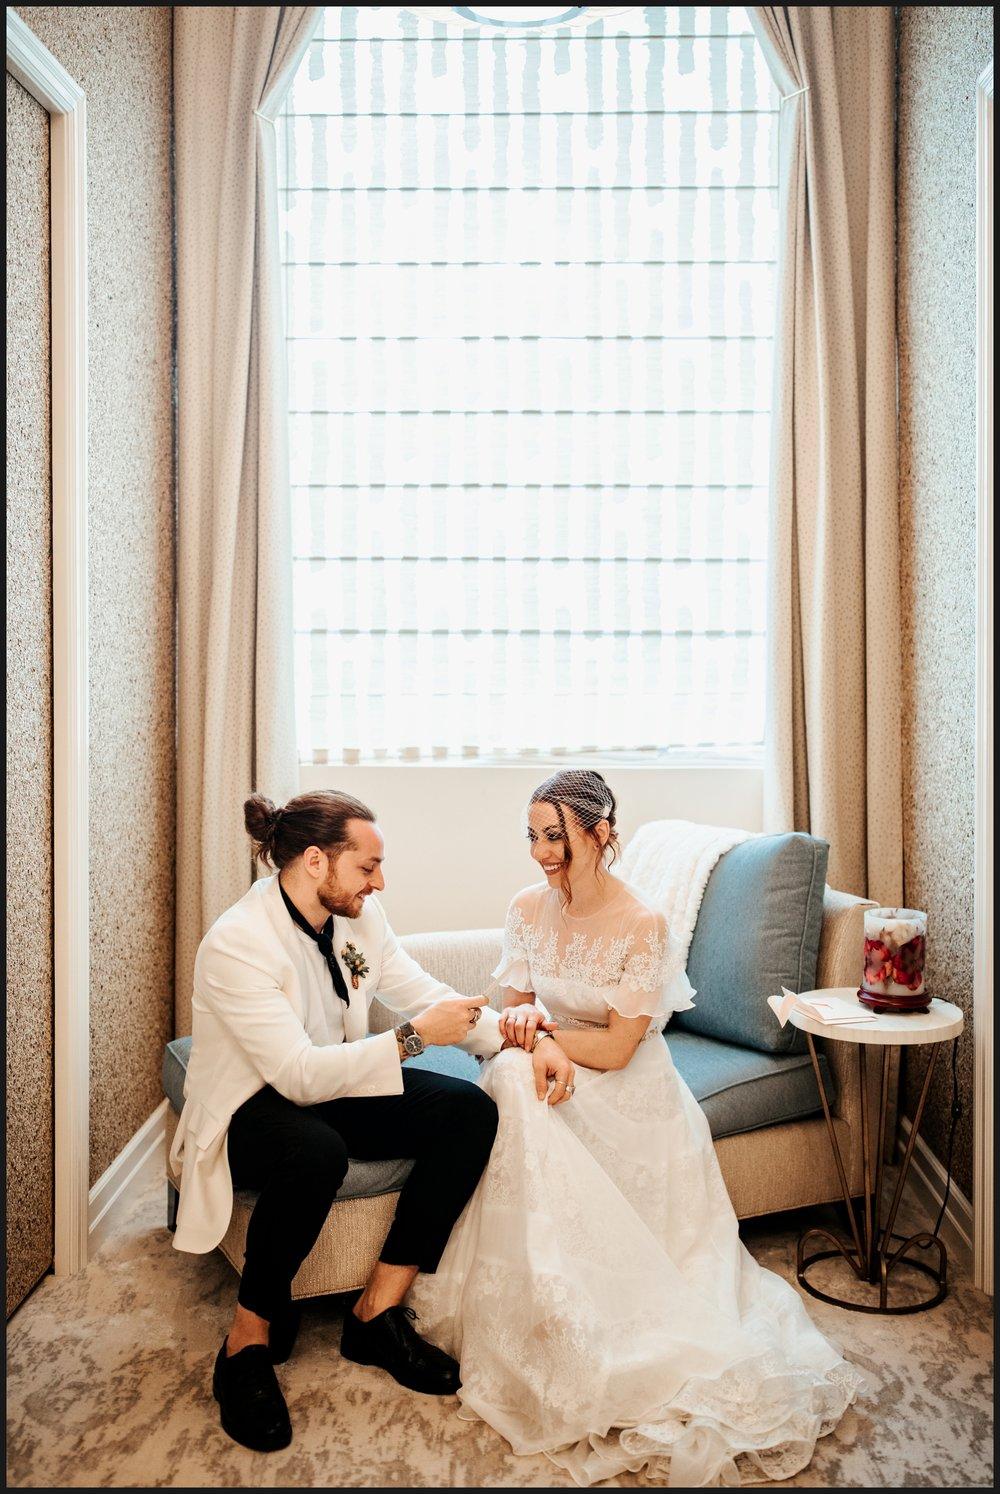 Orlando-Wedding-Photographer-destination-wedding-photographer-florida-wedding-photographer-bohemian-wedding-photographer_1877.jpg